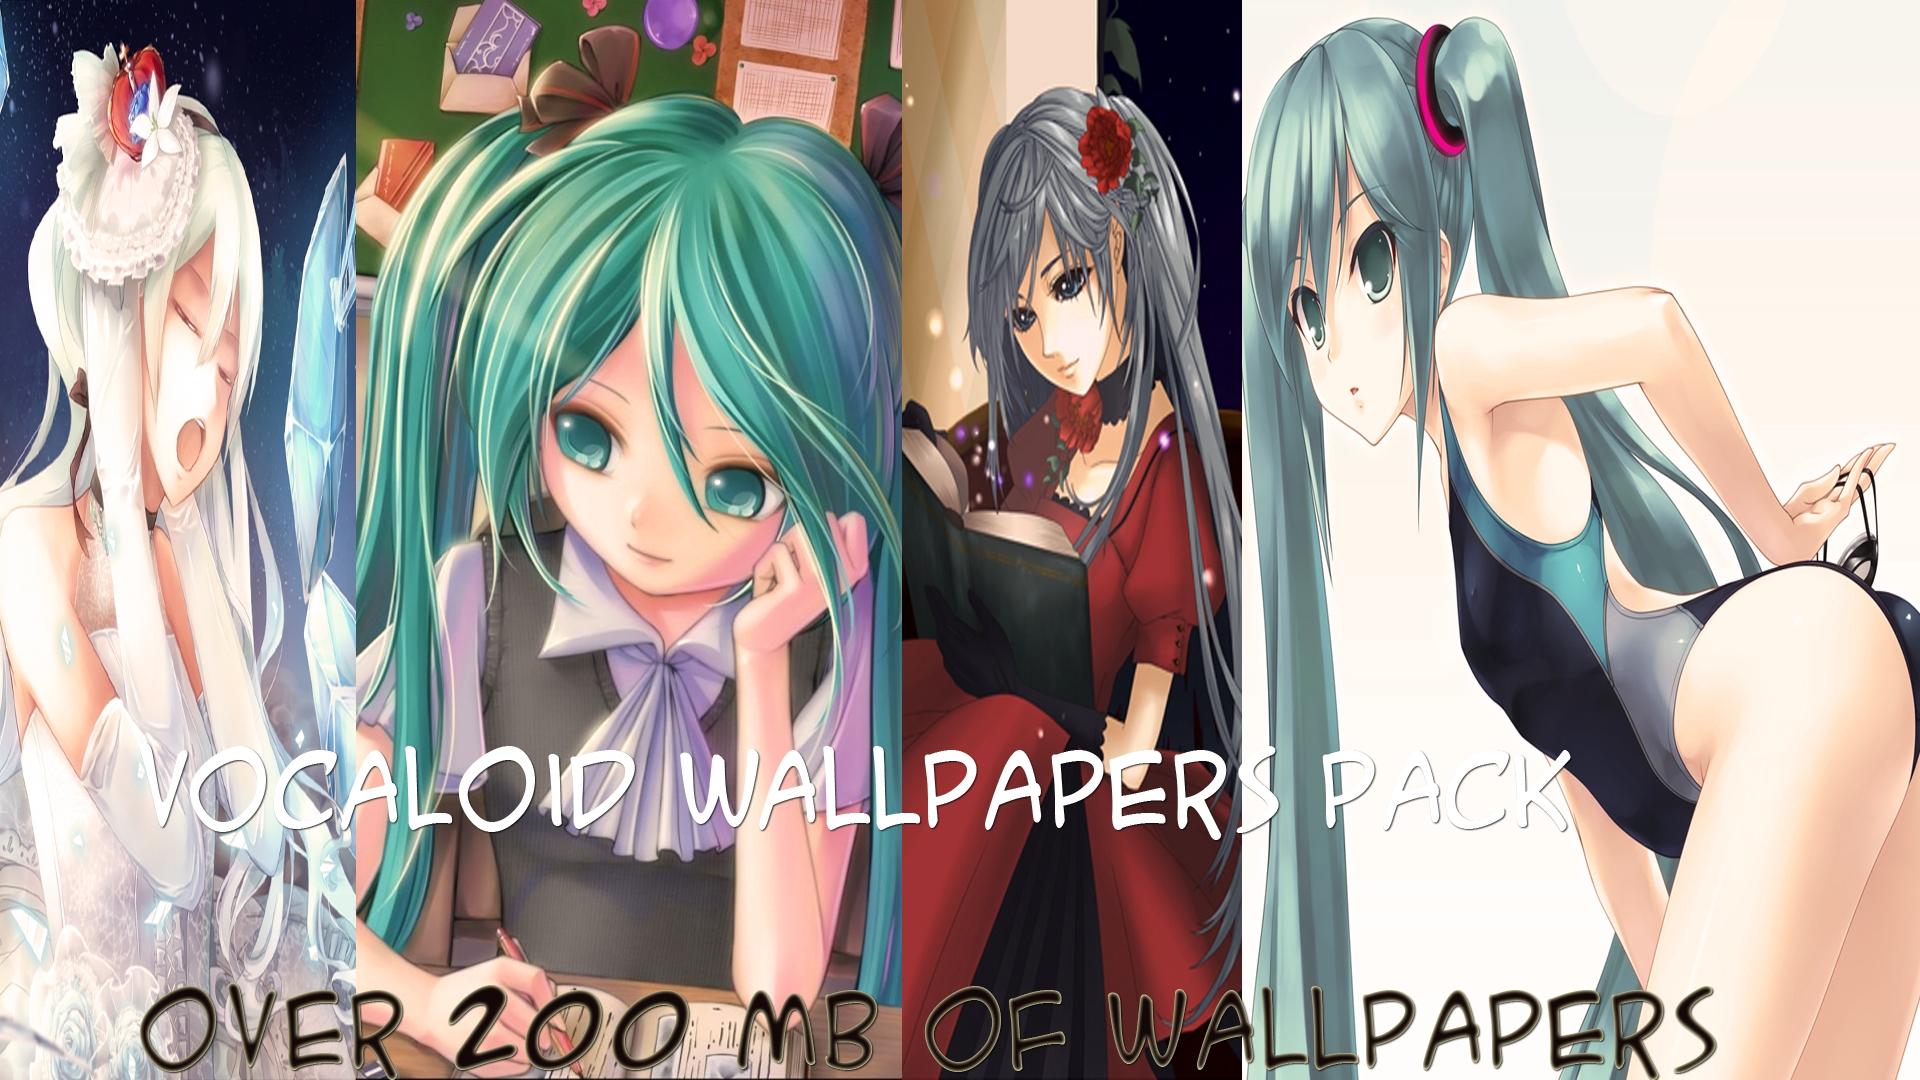 Vocaloid wallpaper pack wallpapersafari - Download anime wallpaper pack ...